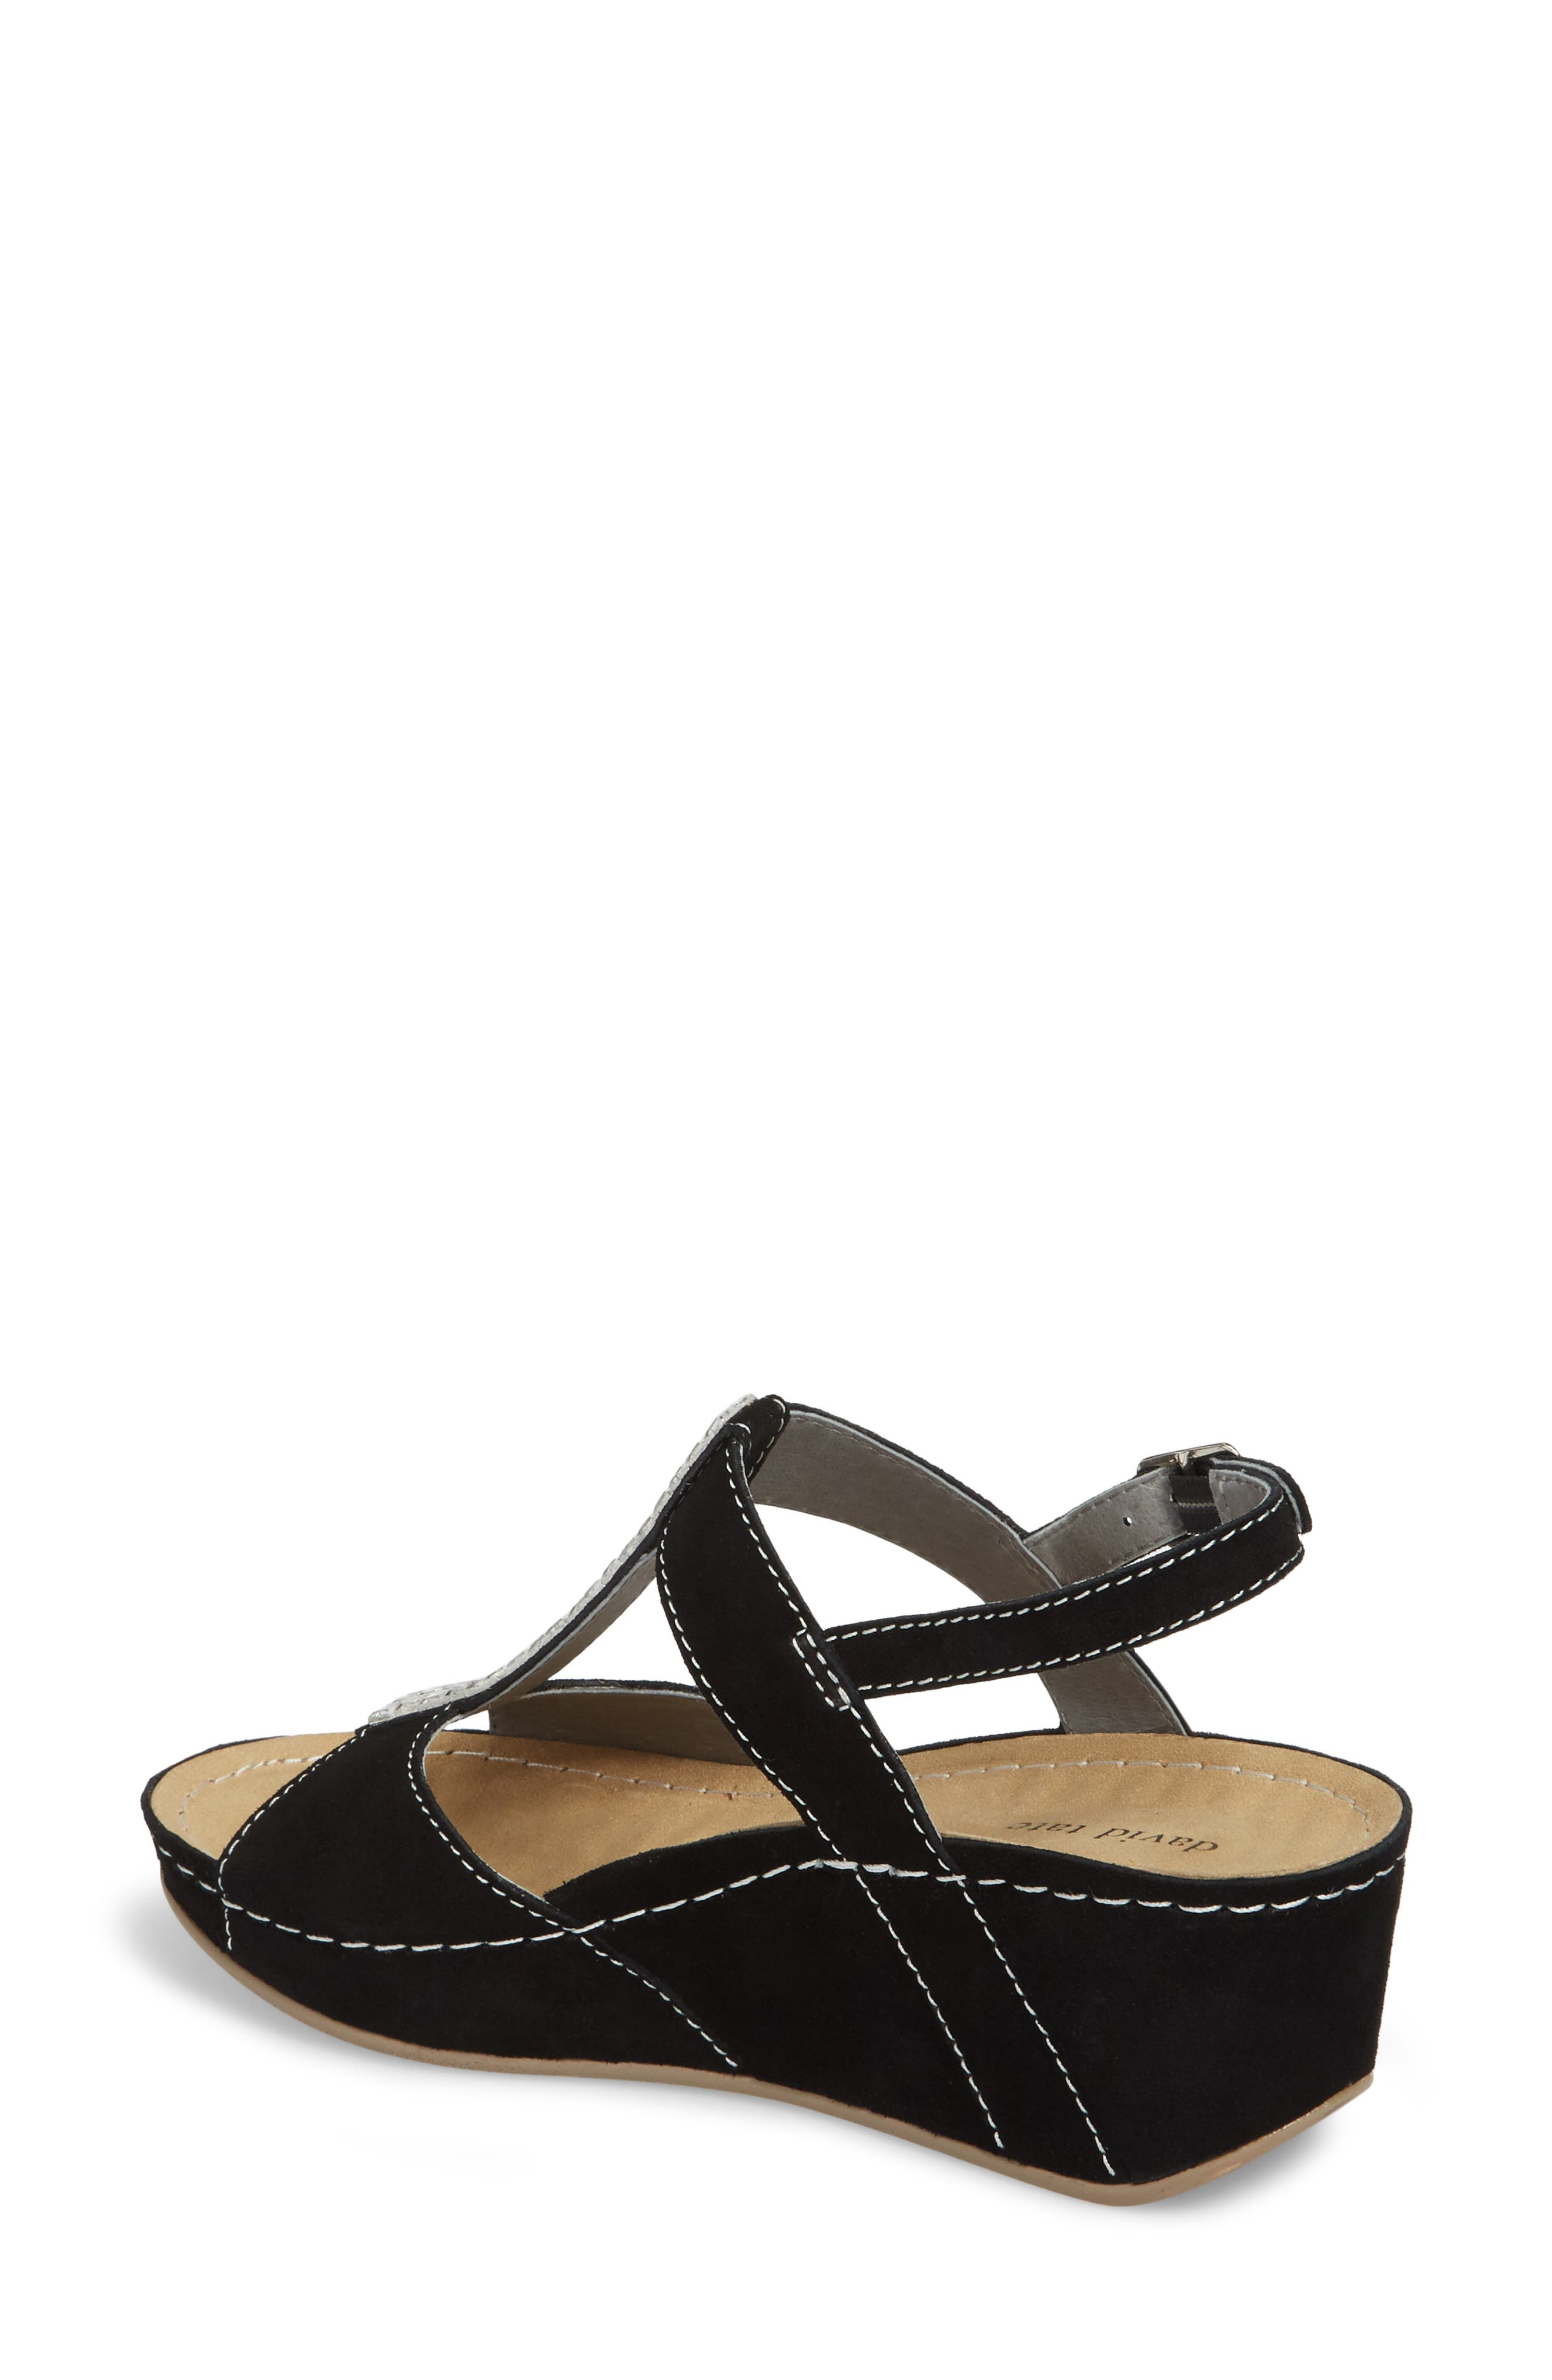 DAVID TATE, Bubbly Embellished T-Strap Wedge Sandal, Alternate thumbnail 2, color, BLACK SUEDE